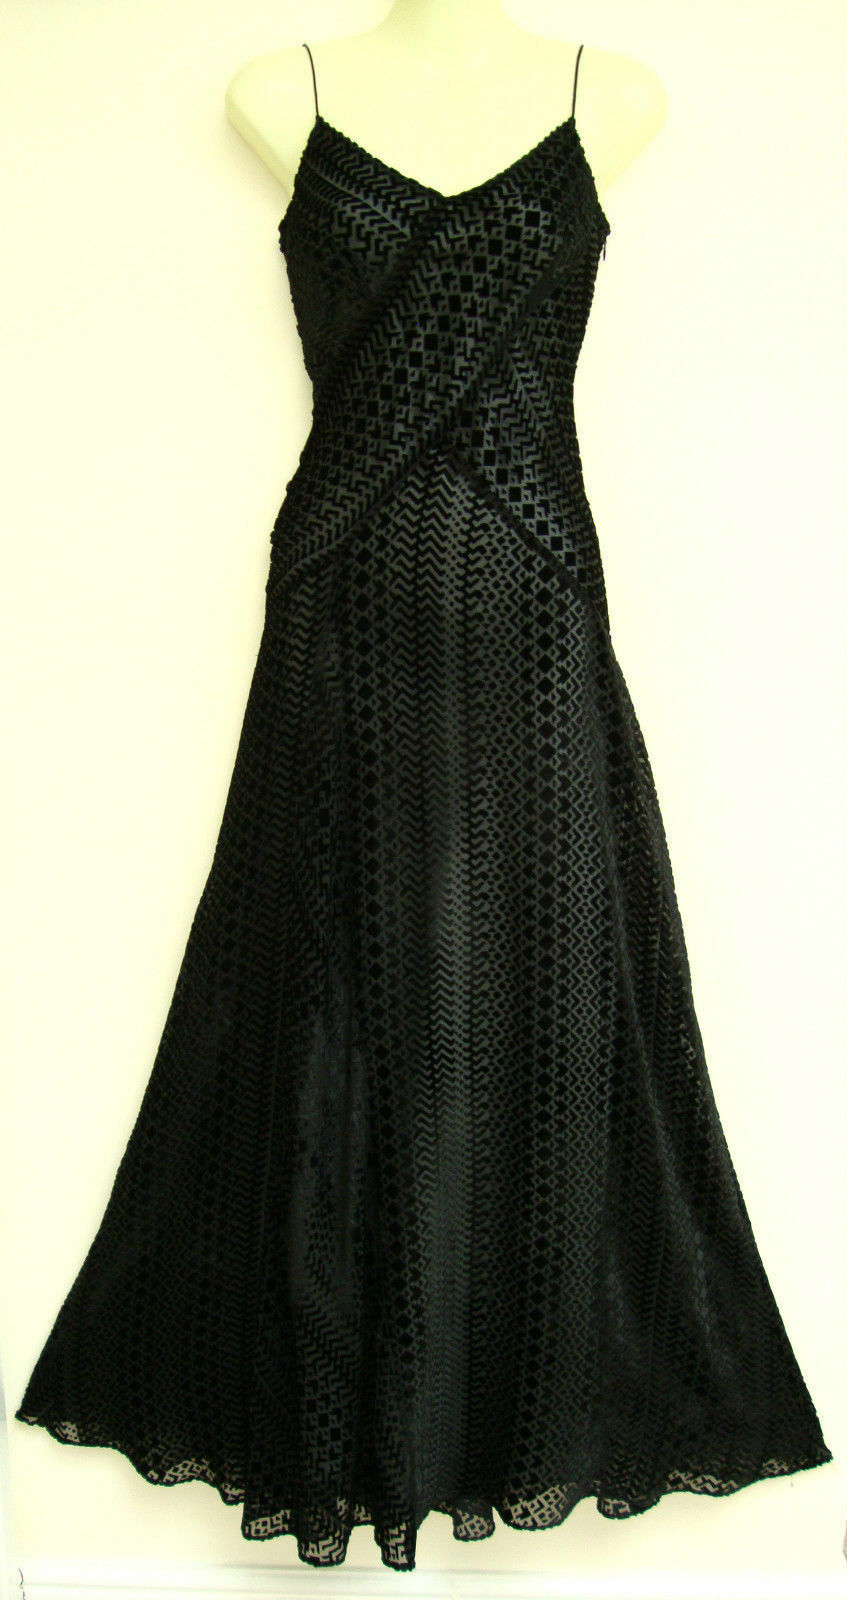 MONSOON SABINA Nero Maxi Lunga DEVORE Cocktail Cocktail Cocktail Prom Dress 10 19c128